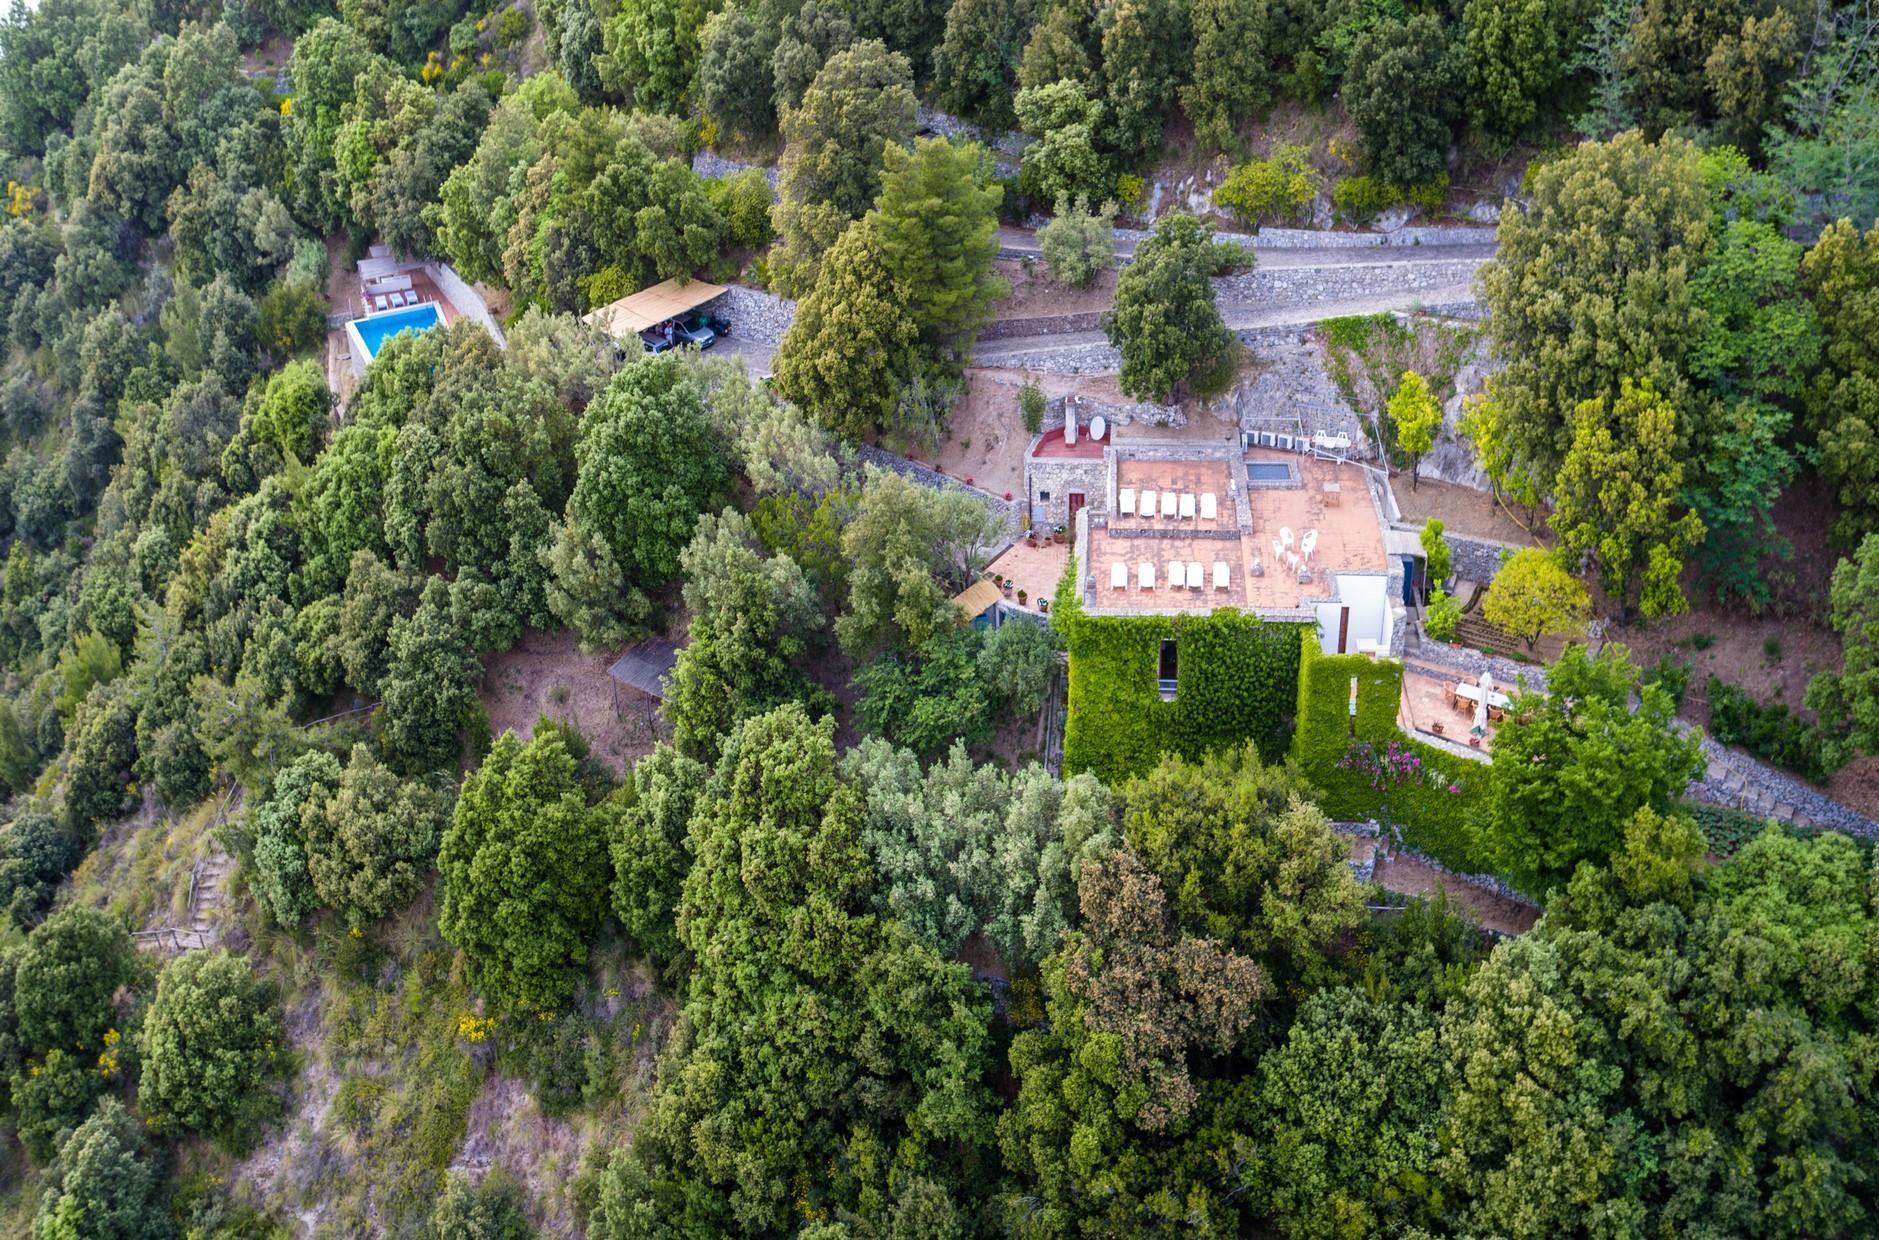 Villa pied dans l'eau in Costiera Amalfitana - 33